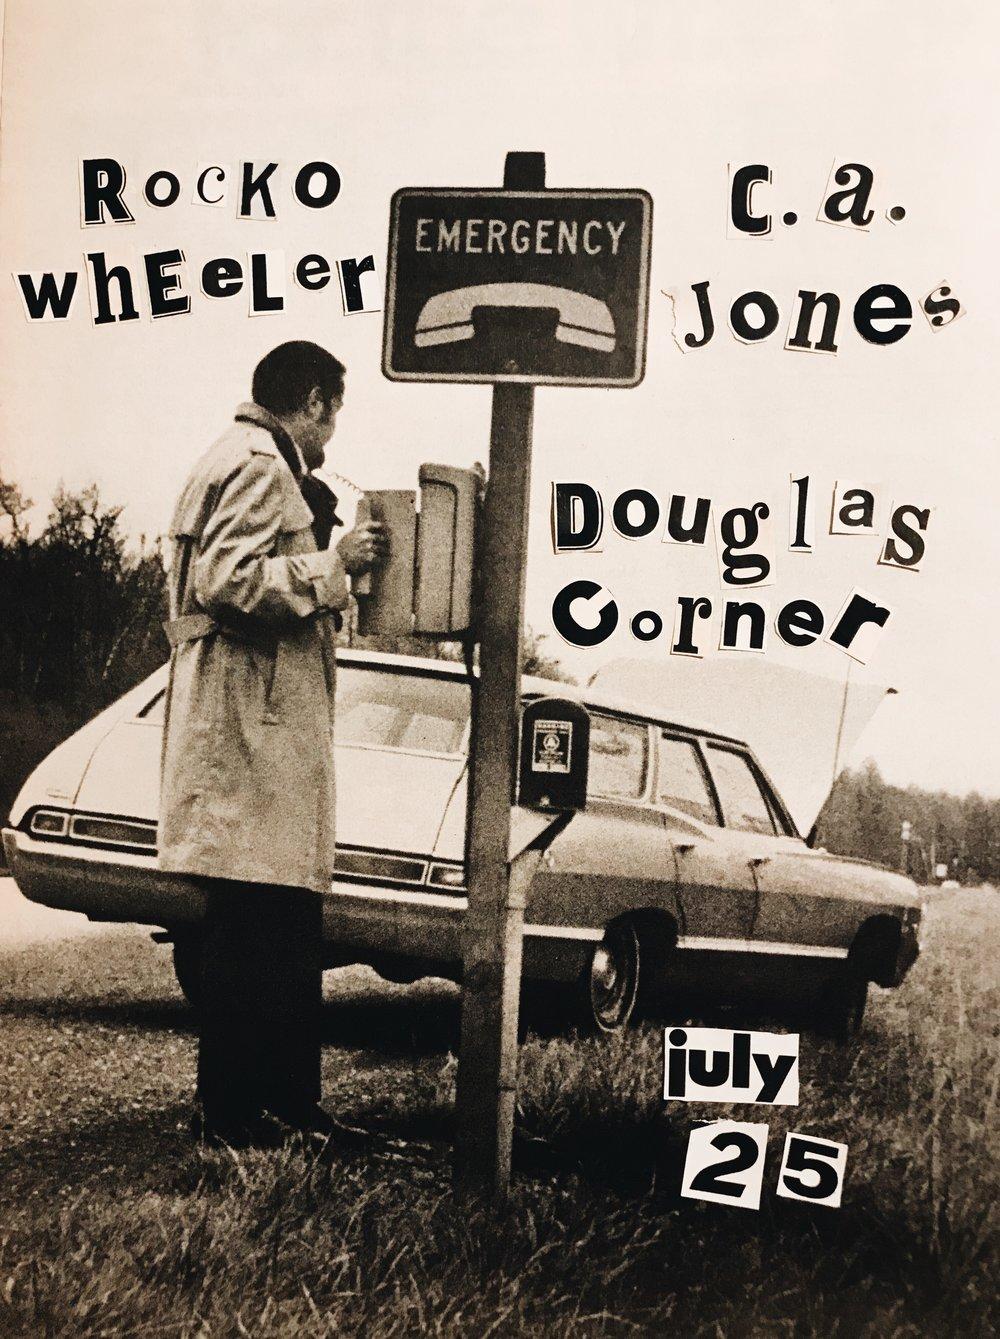 Douglas Corner Flier.JPG